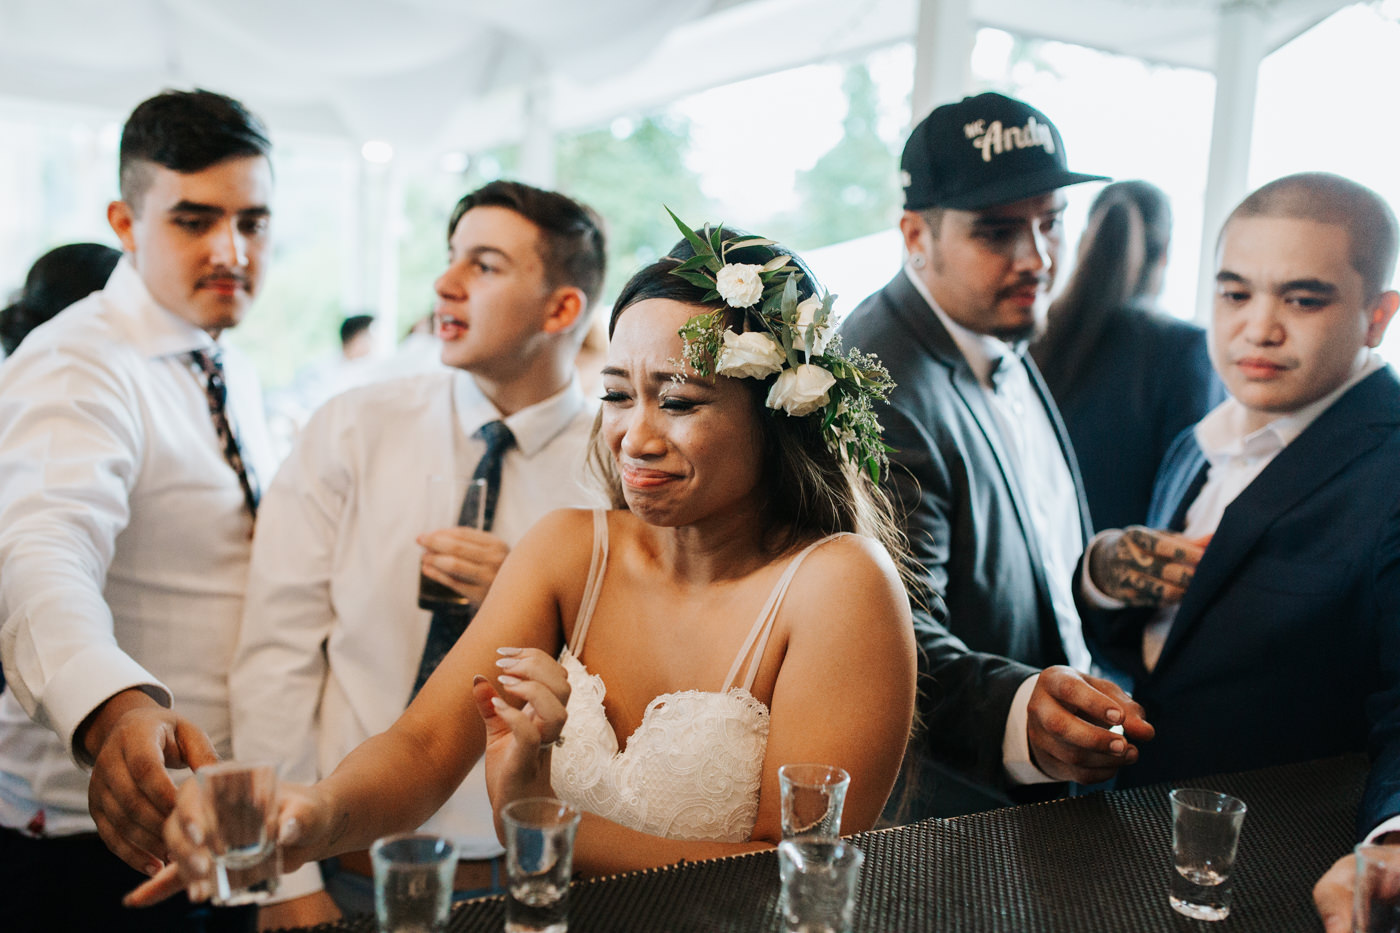 Nick & Vanezza - Fernbank Farm Wedding - Samantha Heather Photography-138.jpg